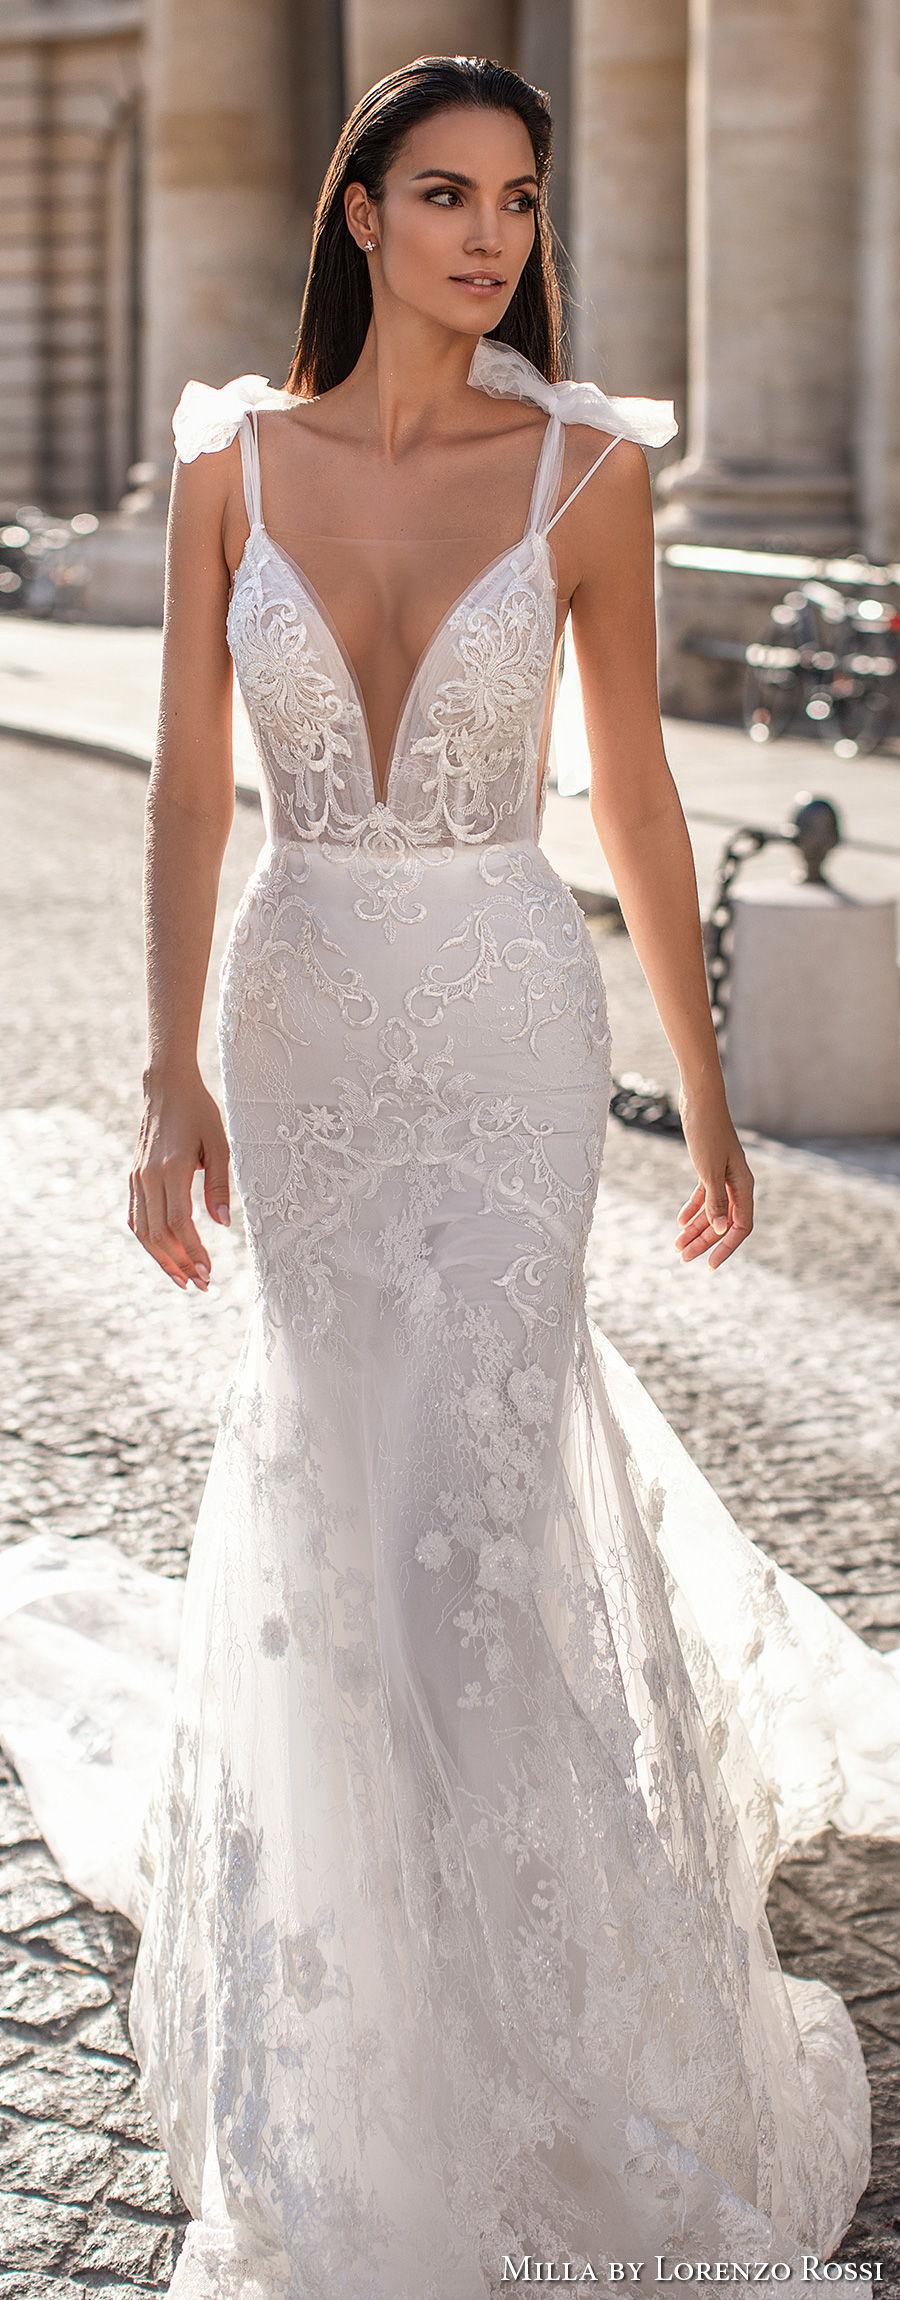 Milla By Lorenzo Rossi Wedding Dresses For Every Bride 2020 2021 Paris Bridal Collection Wedding Inspirasi,Summer Elegant Pakistani Wedding Guest Dresses